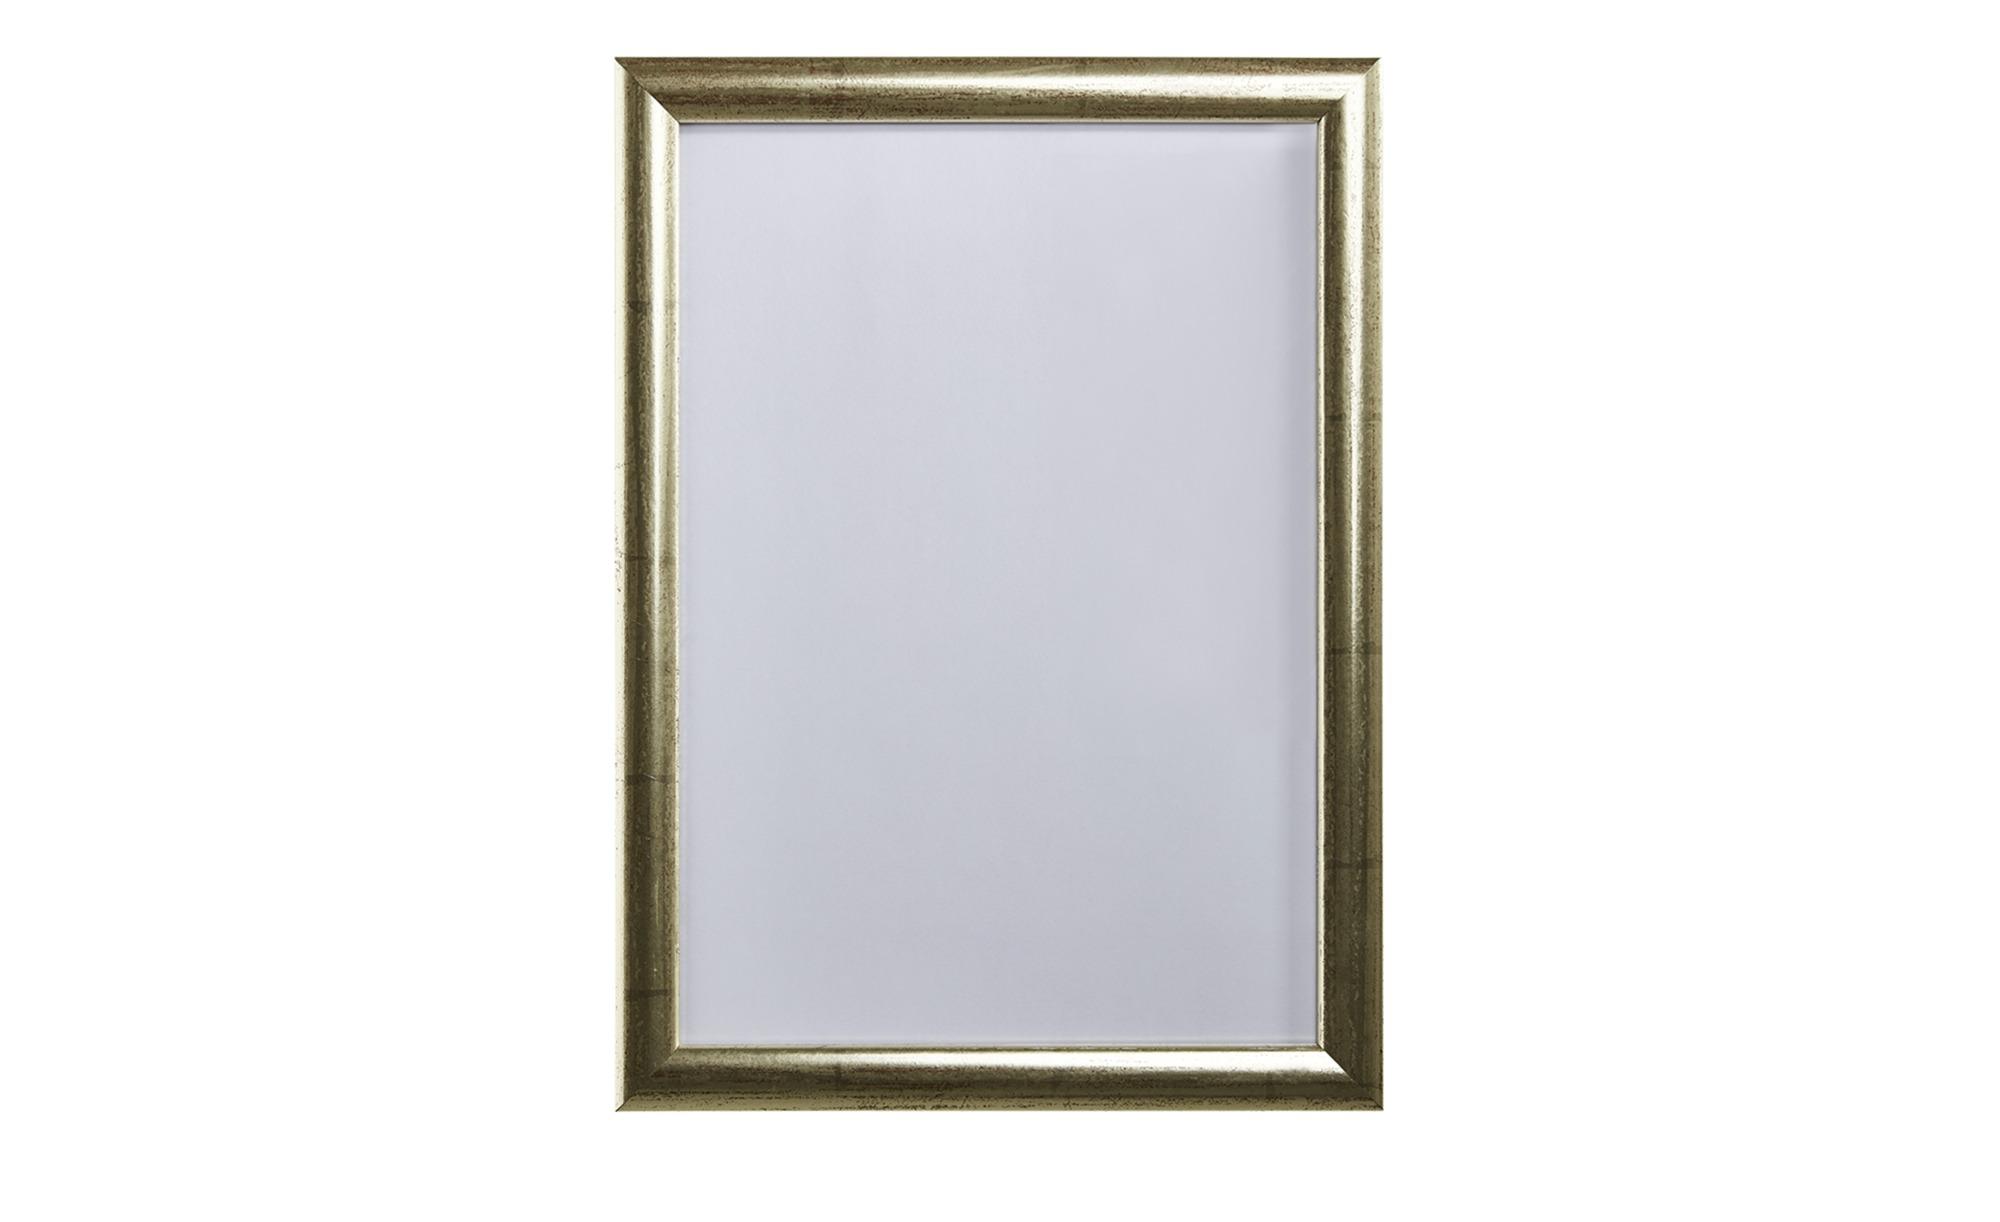 Bilderrahmen - silber - 21 cm - 30 cm - Dekoration > Bilderrahmen - Möbel Kraft | Dekoration > Bilder und Rahmen > Rahmen | Sconto